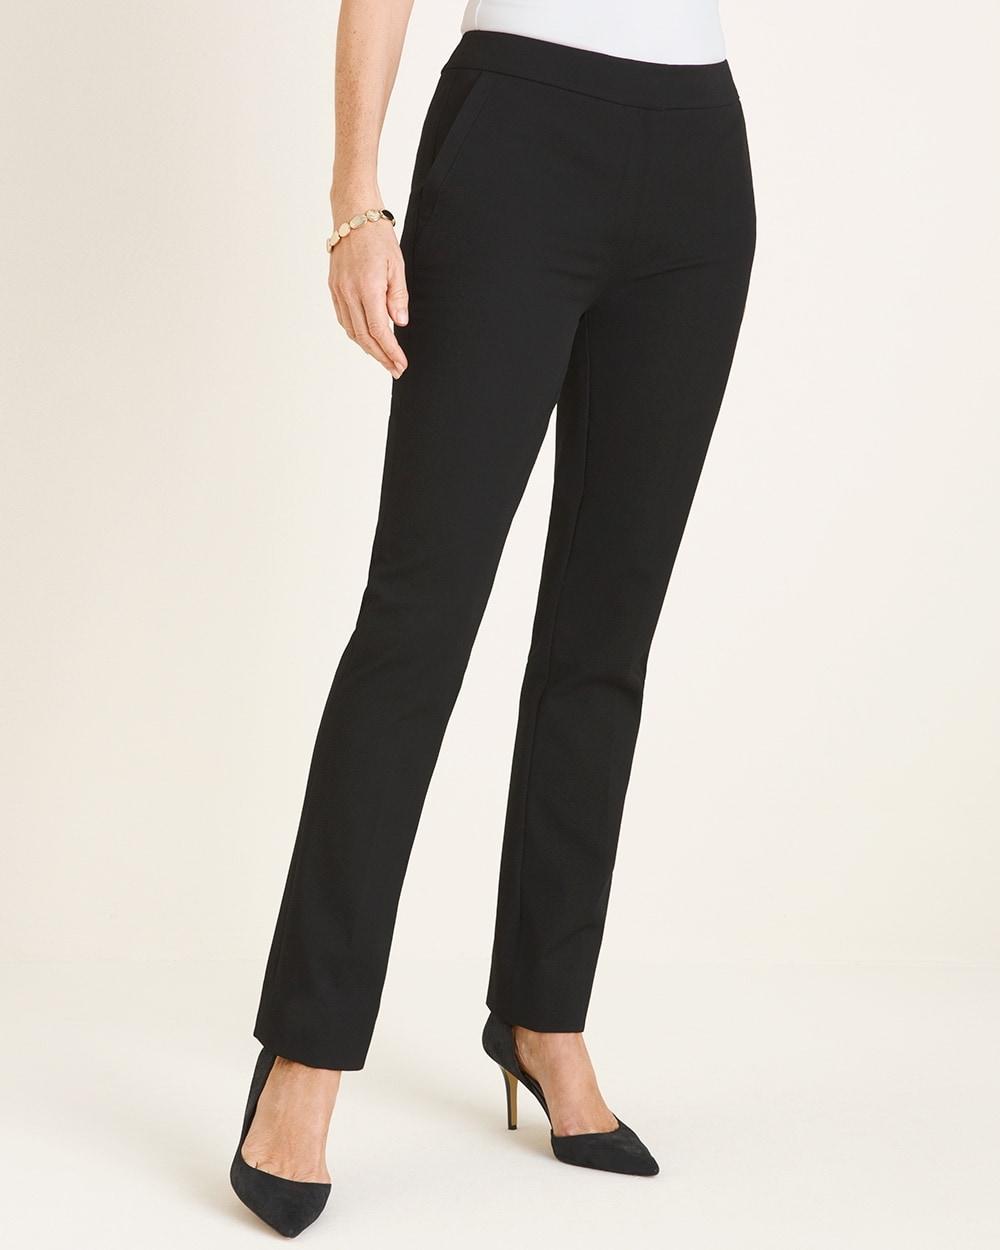 2a2249bebd7 Straight-Leg Pants - Chico s